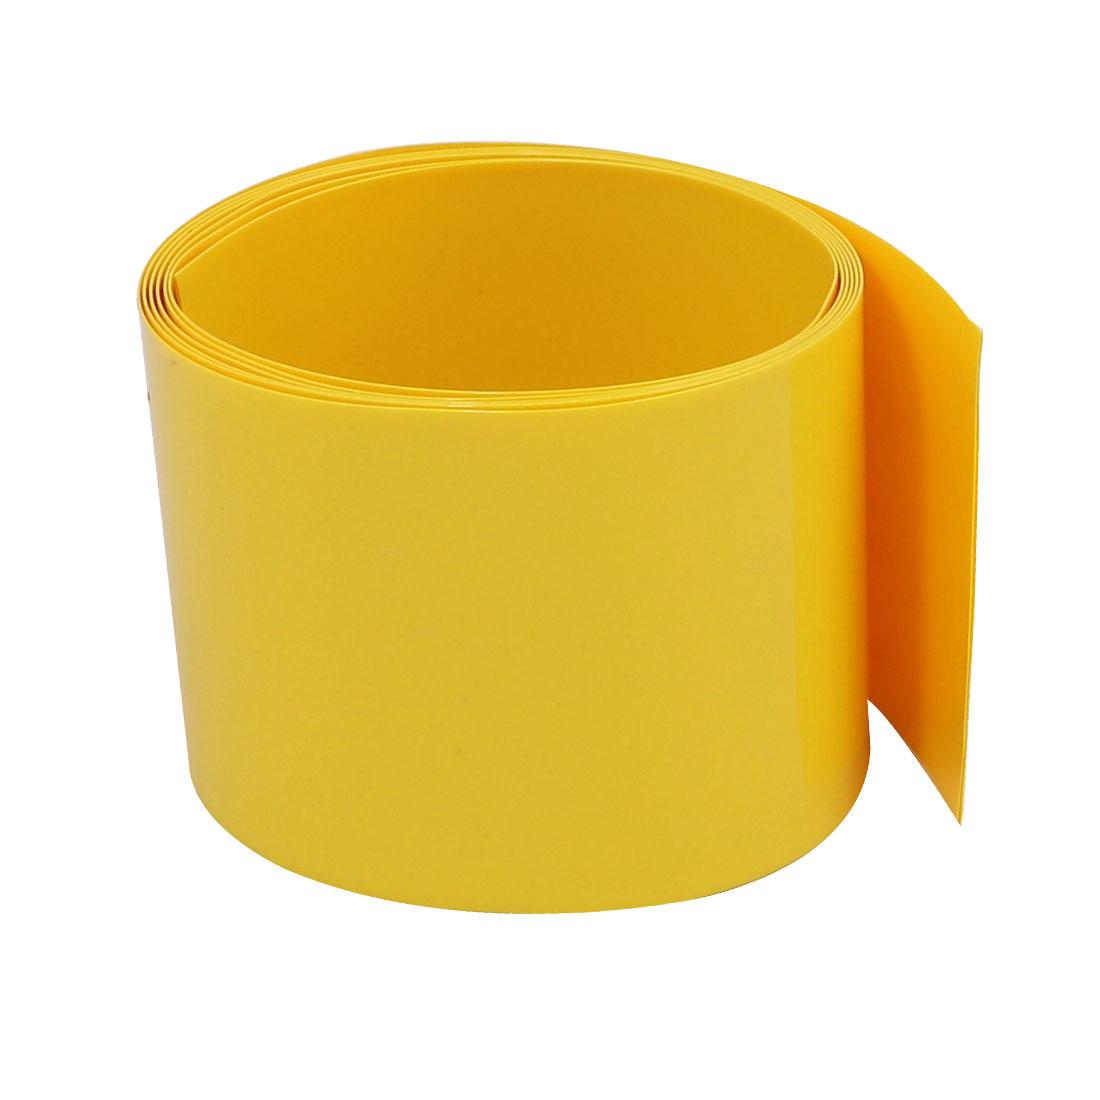 36mm Flat Width 1M Long PVC Heat Shrinkable Tube Yellow for 22650 Battery Pack